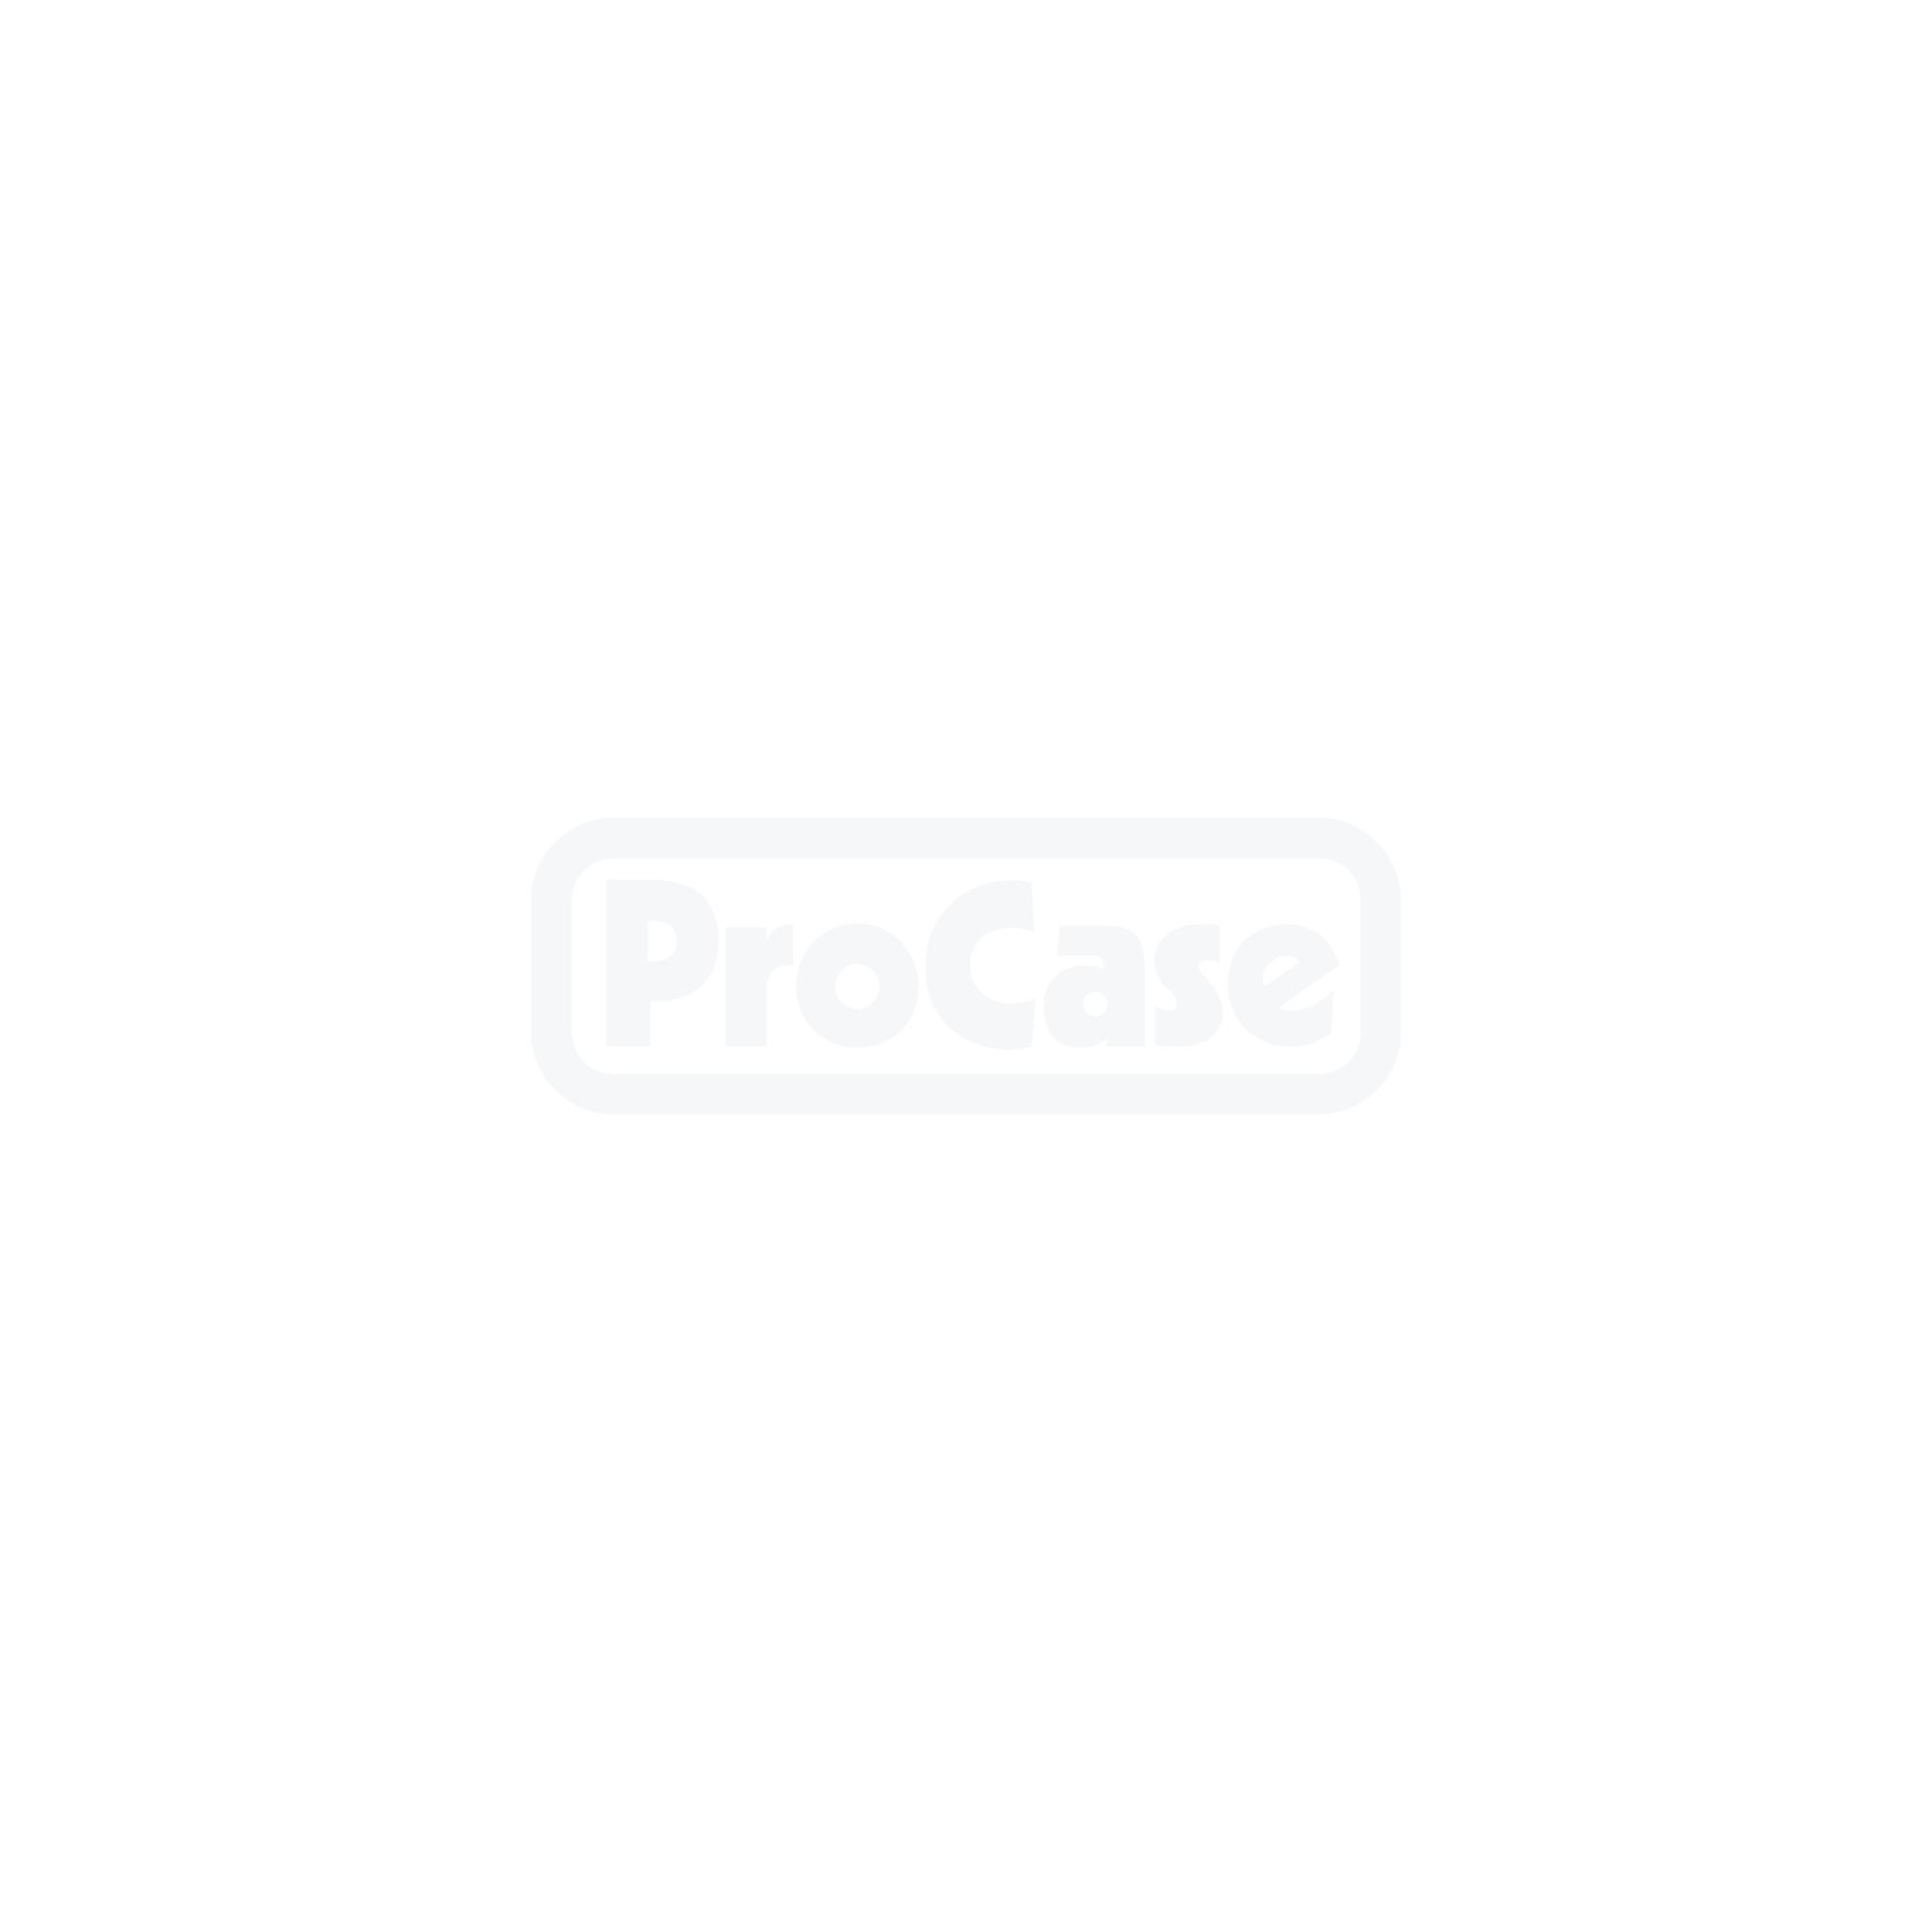 SKB 3i Koffer 2617-12B mit Rasterschaumstoff 3